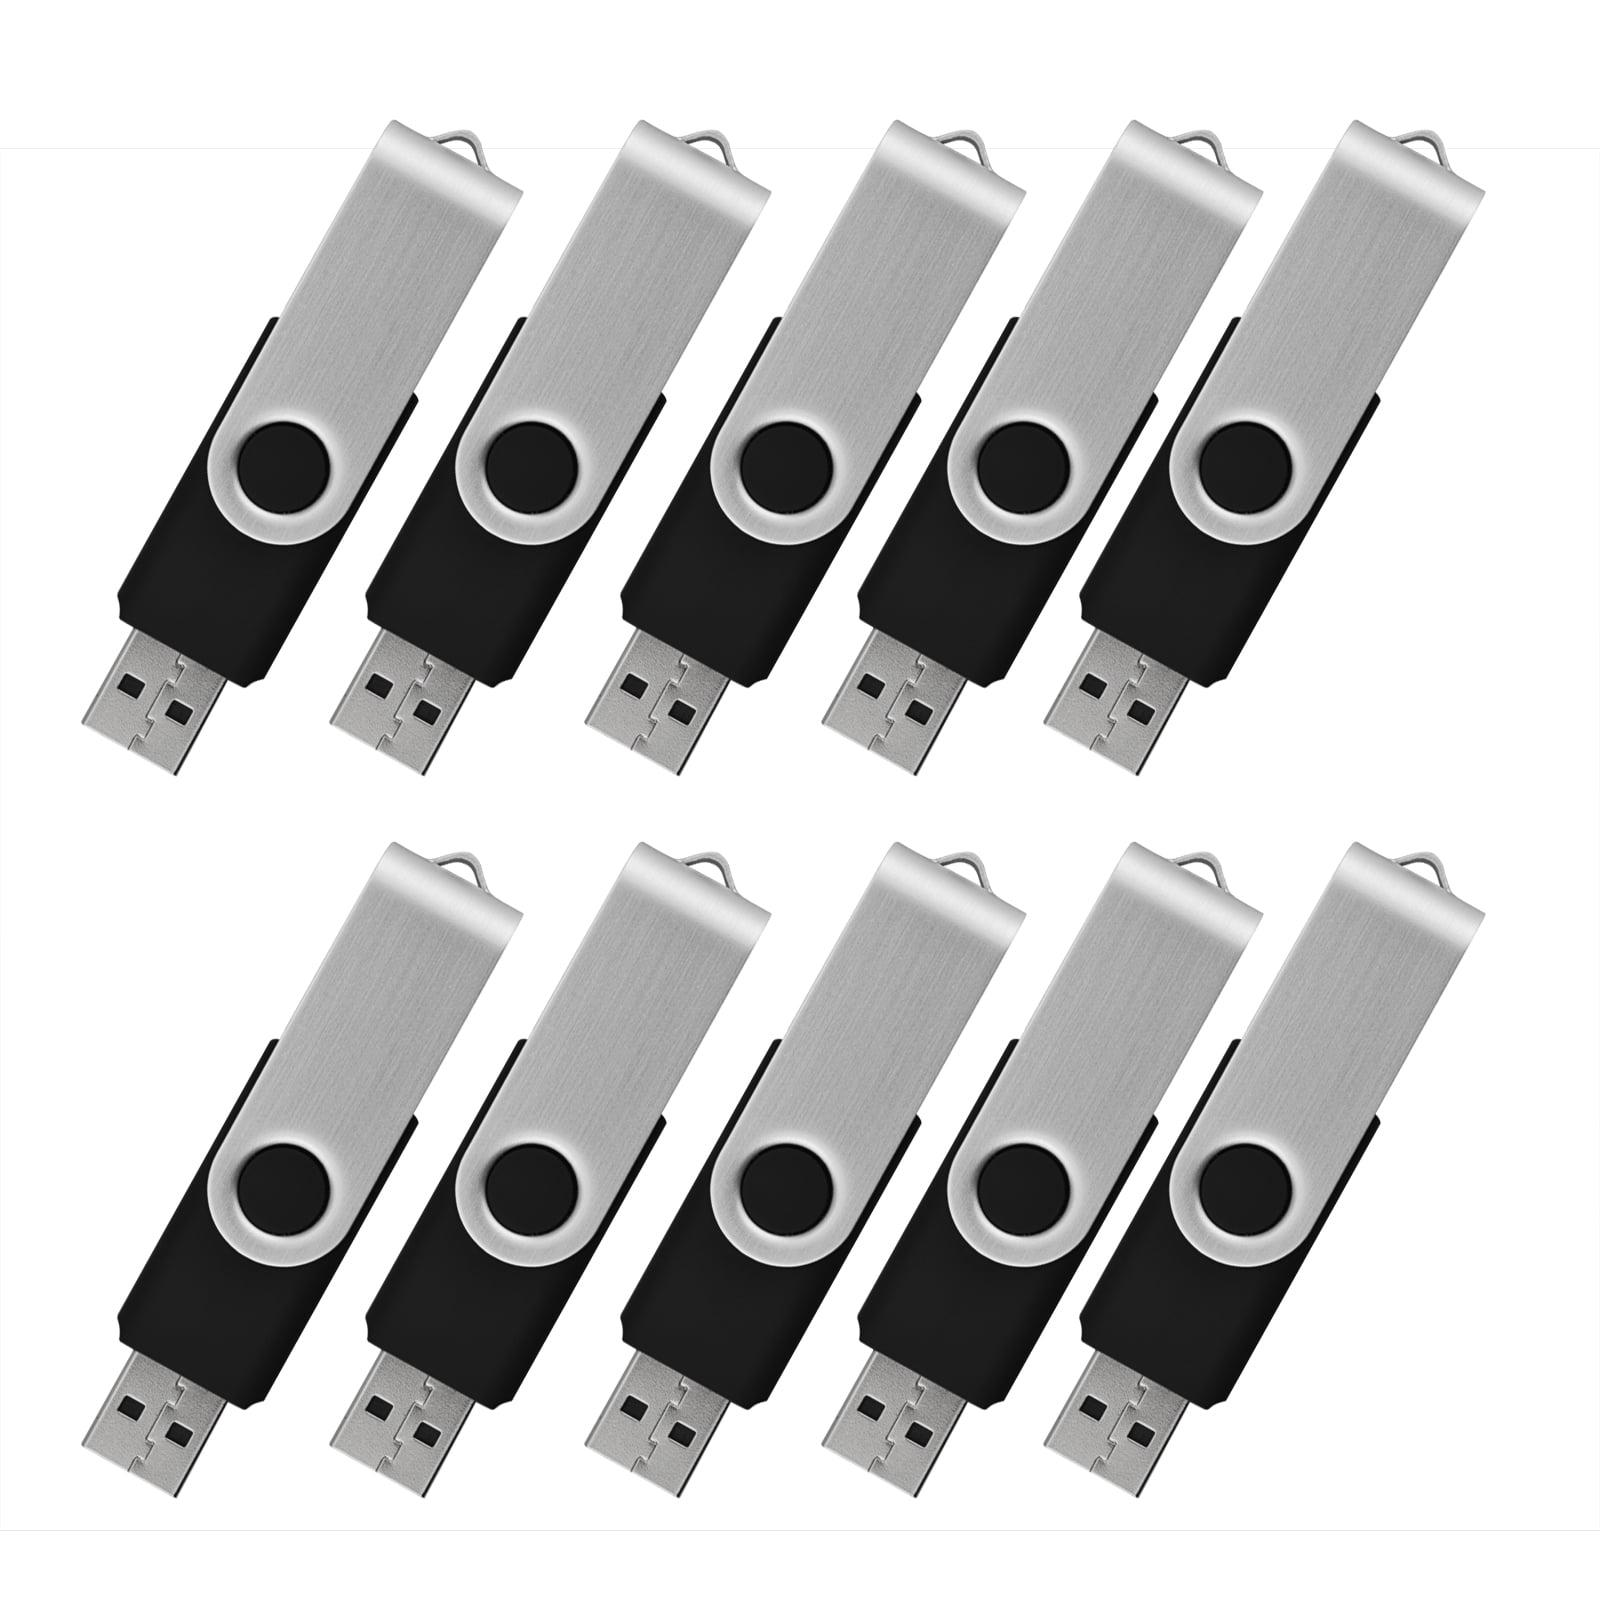 KOOTION 10 Pack 2GB USB Flash Drive Memory Stick Fold Storage Thumb Pen Drive Swivel, Black